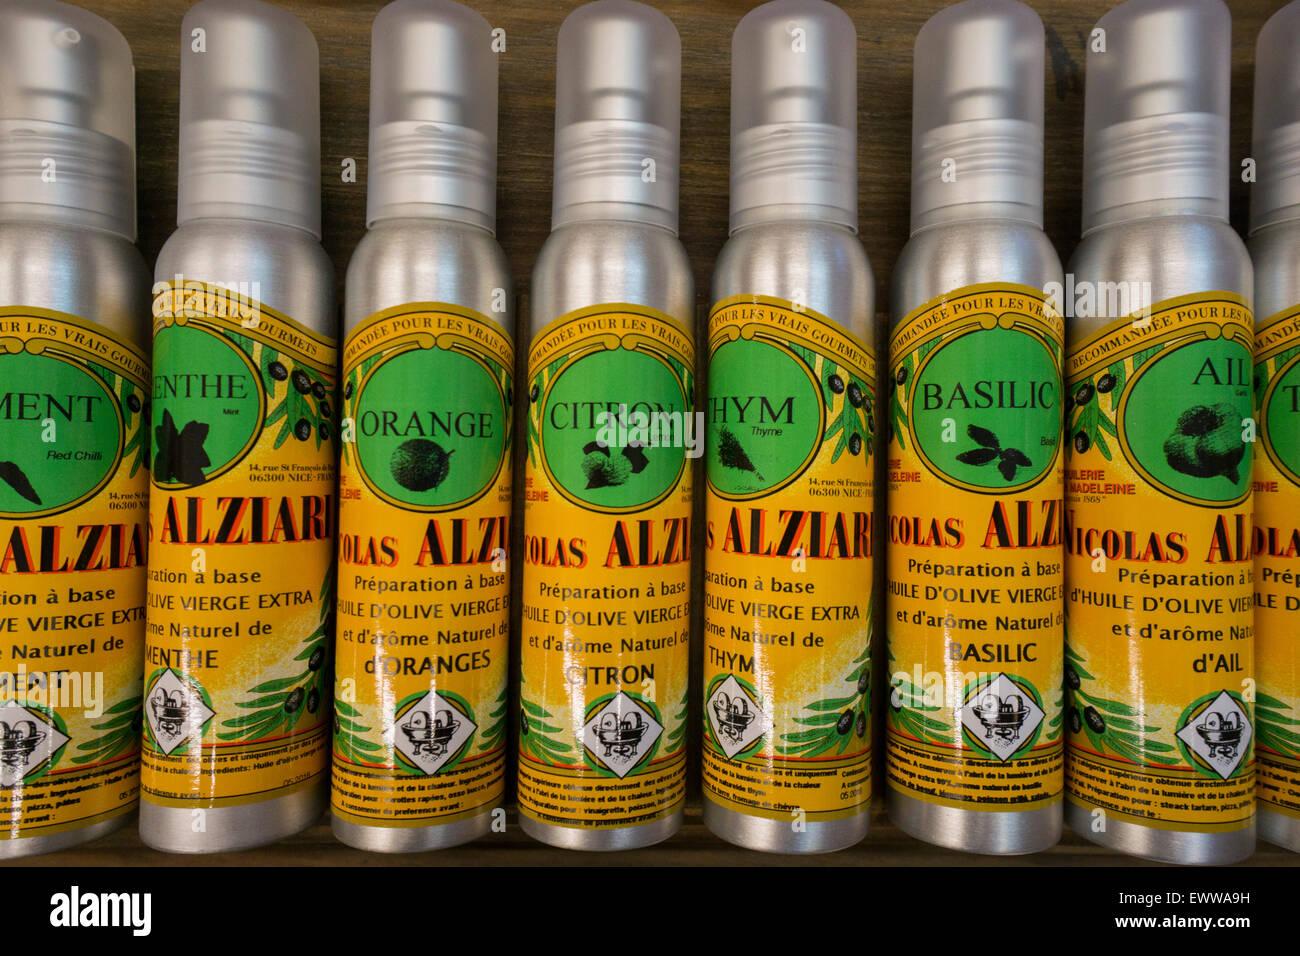 Nicolas Alziari Olive Oil Shop , Nice, Alpes Maritimes, Provence, French Riviera, Mediterranean, France, Europe, - Stock Image